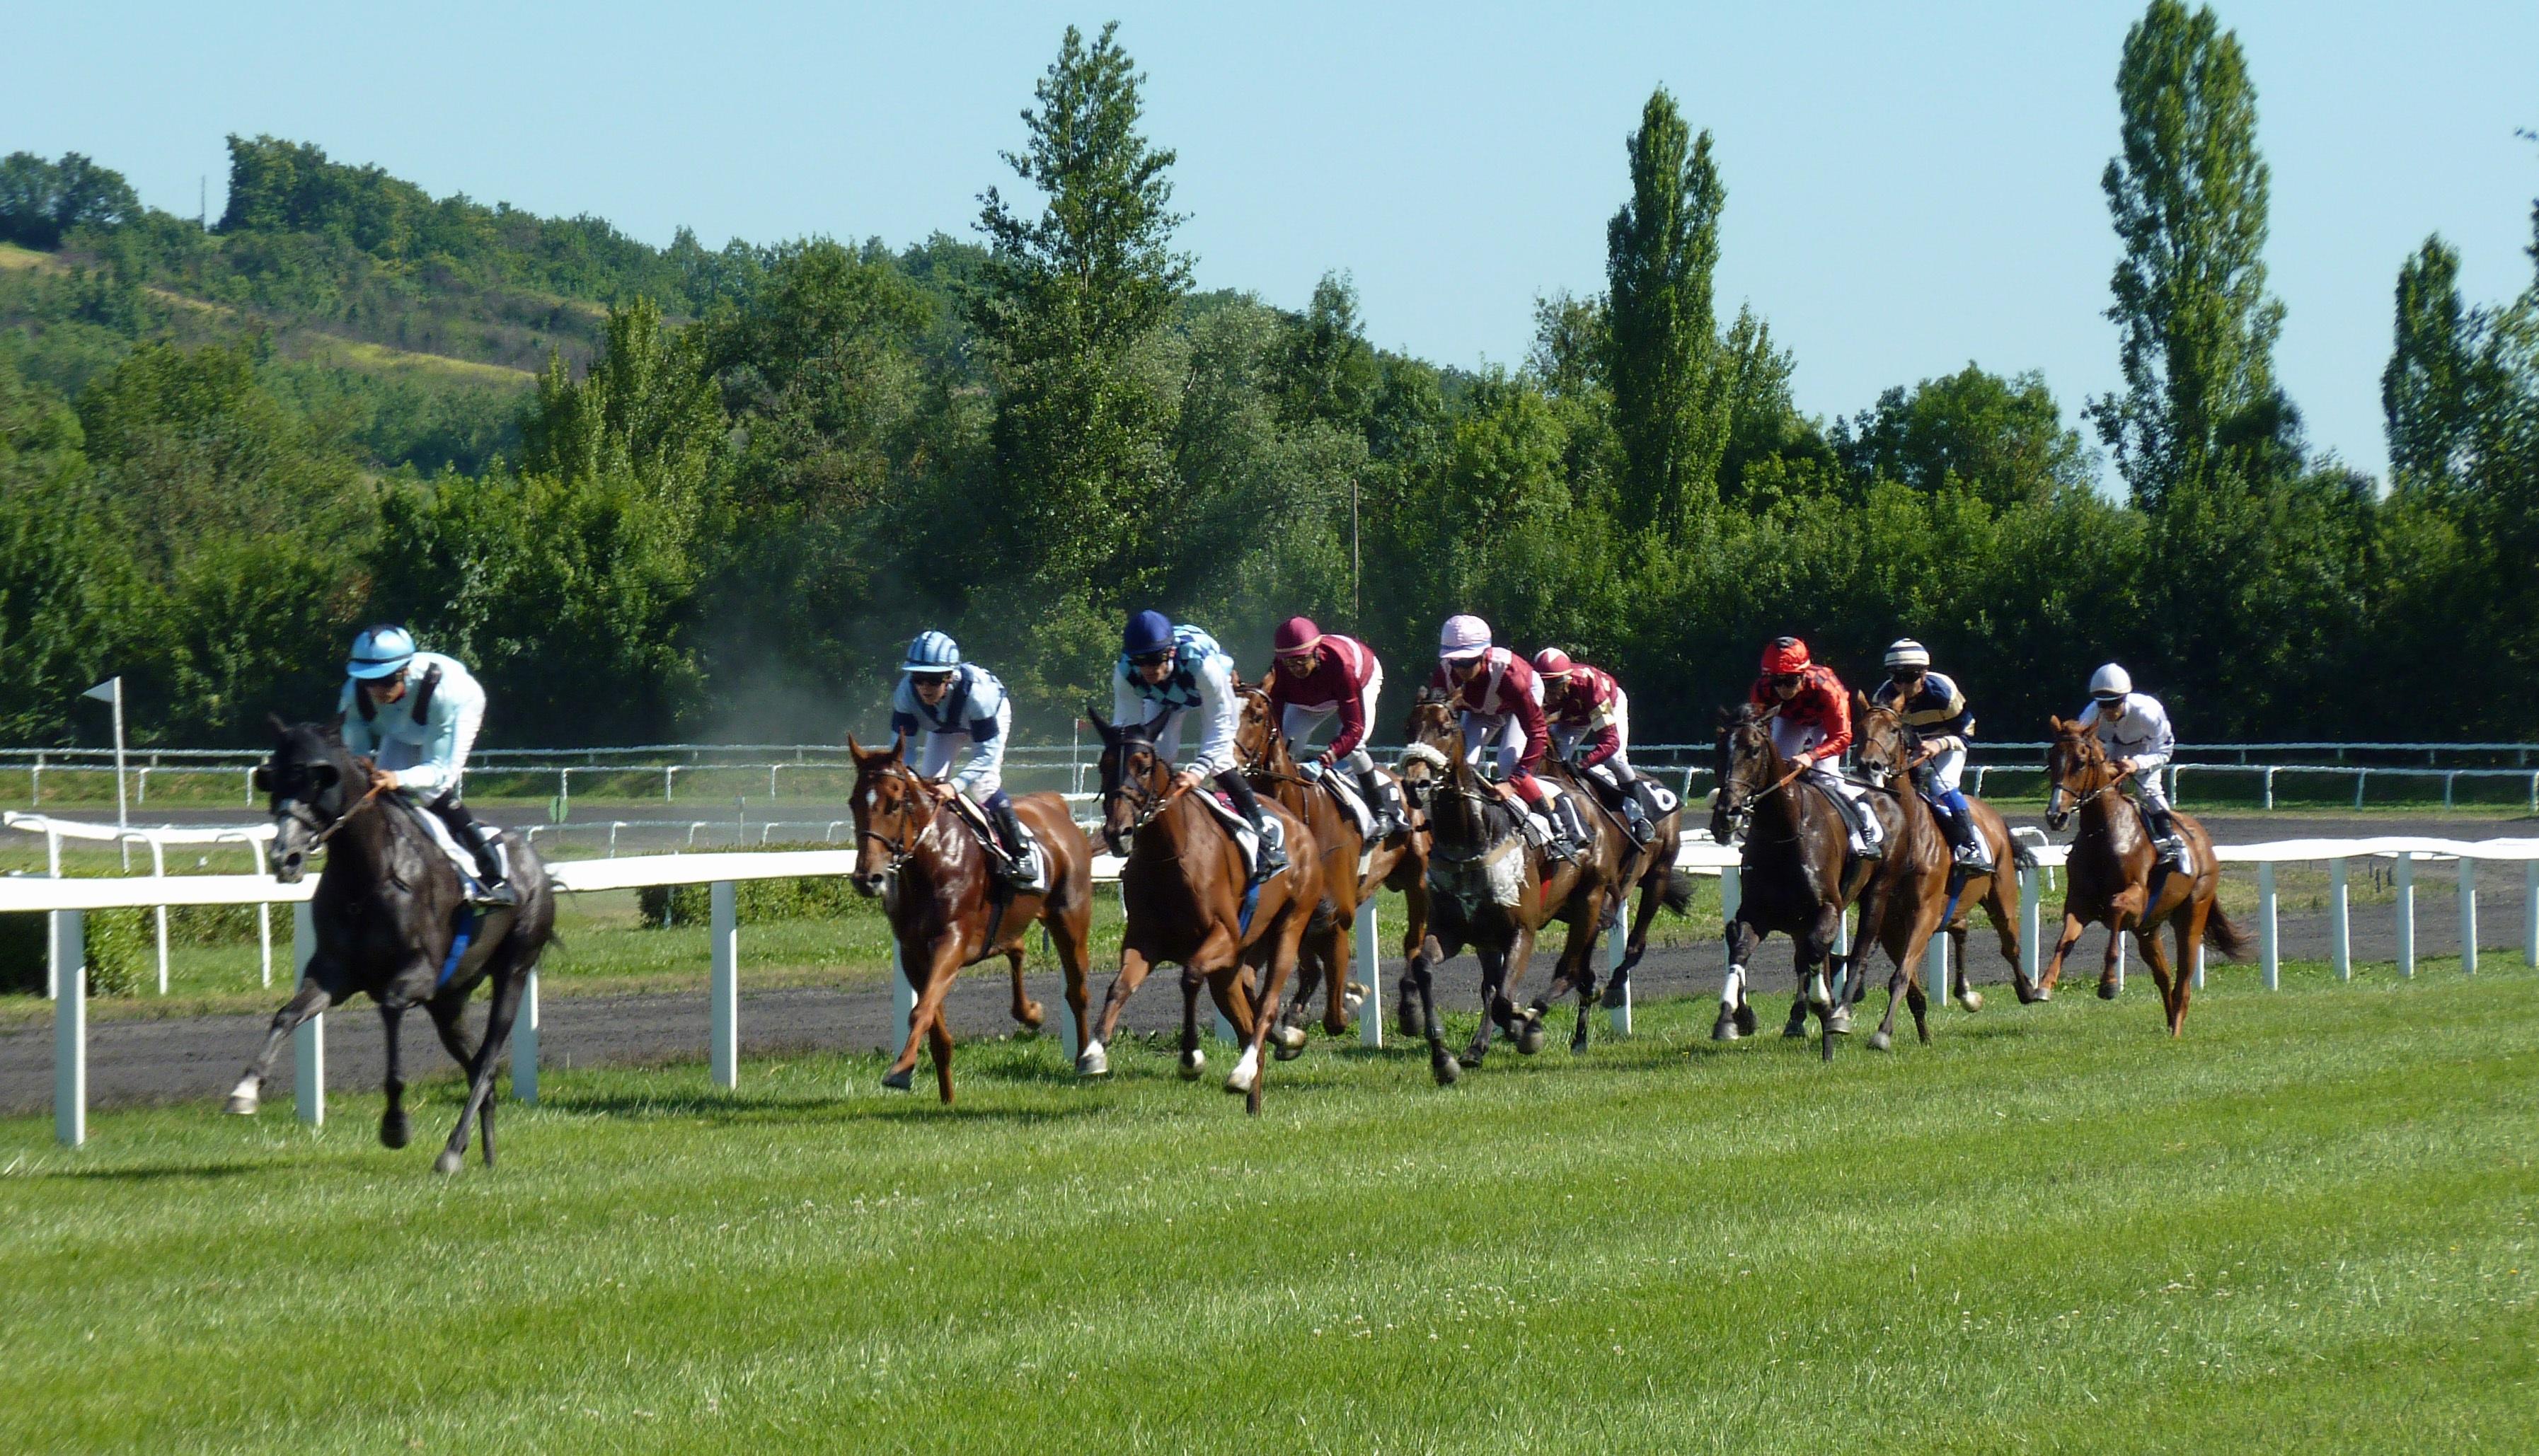 Horse Race Horses Sports Racing Jockey Bet Hippodrome Jockeys Castera Verduzan Pmu